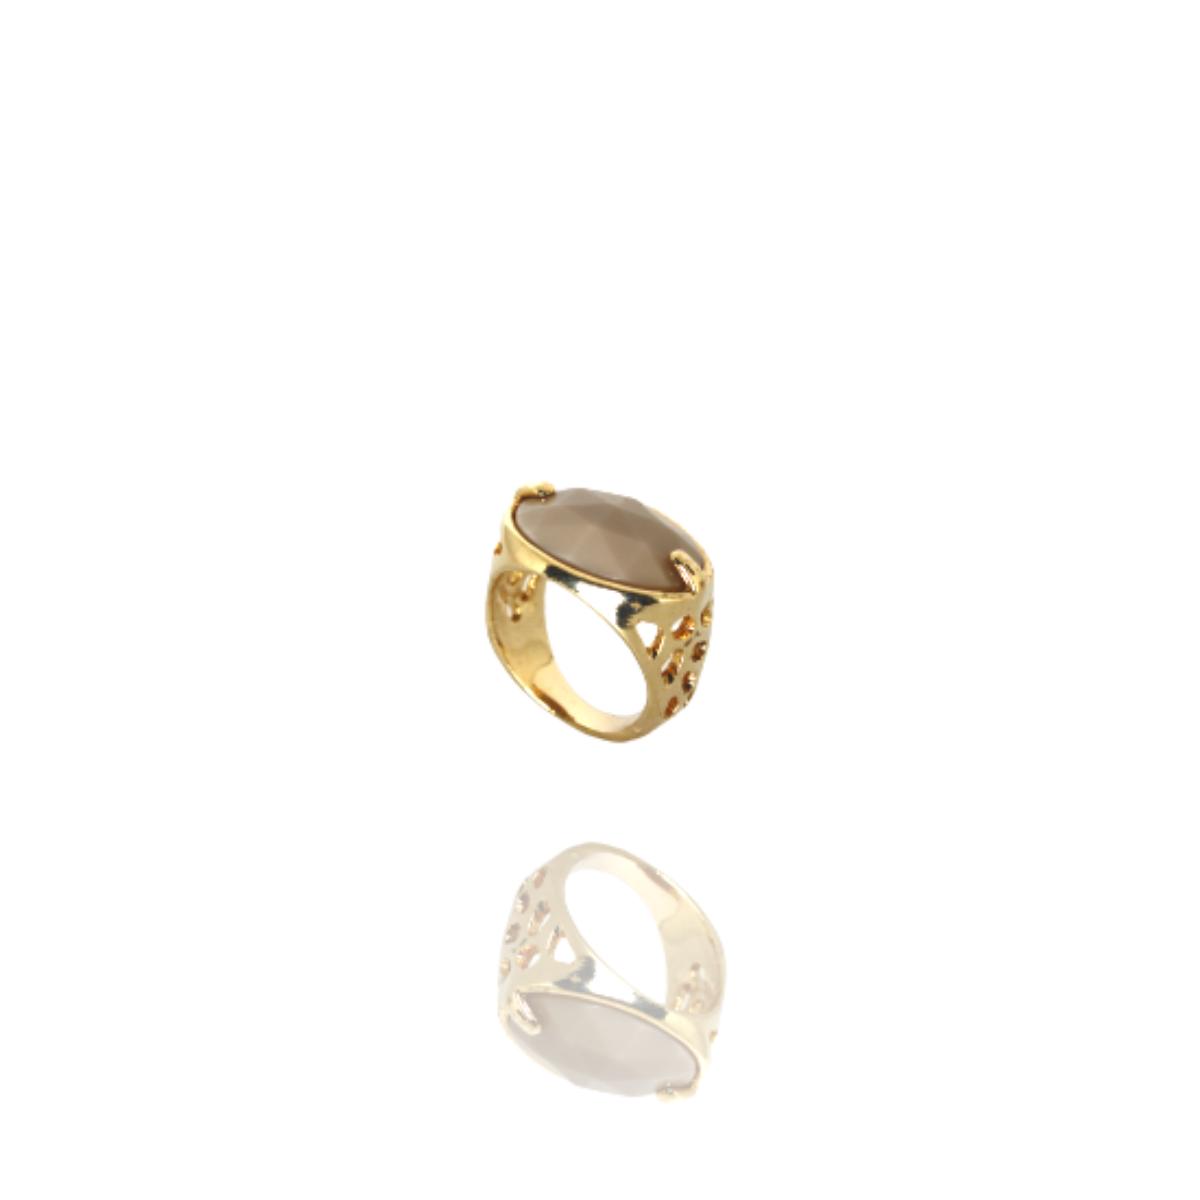 Anel Barbara Strauss Semi Joia Tânger Em Resina Lalique Bege, Rev. Em Ouro Amarelo 18K